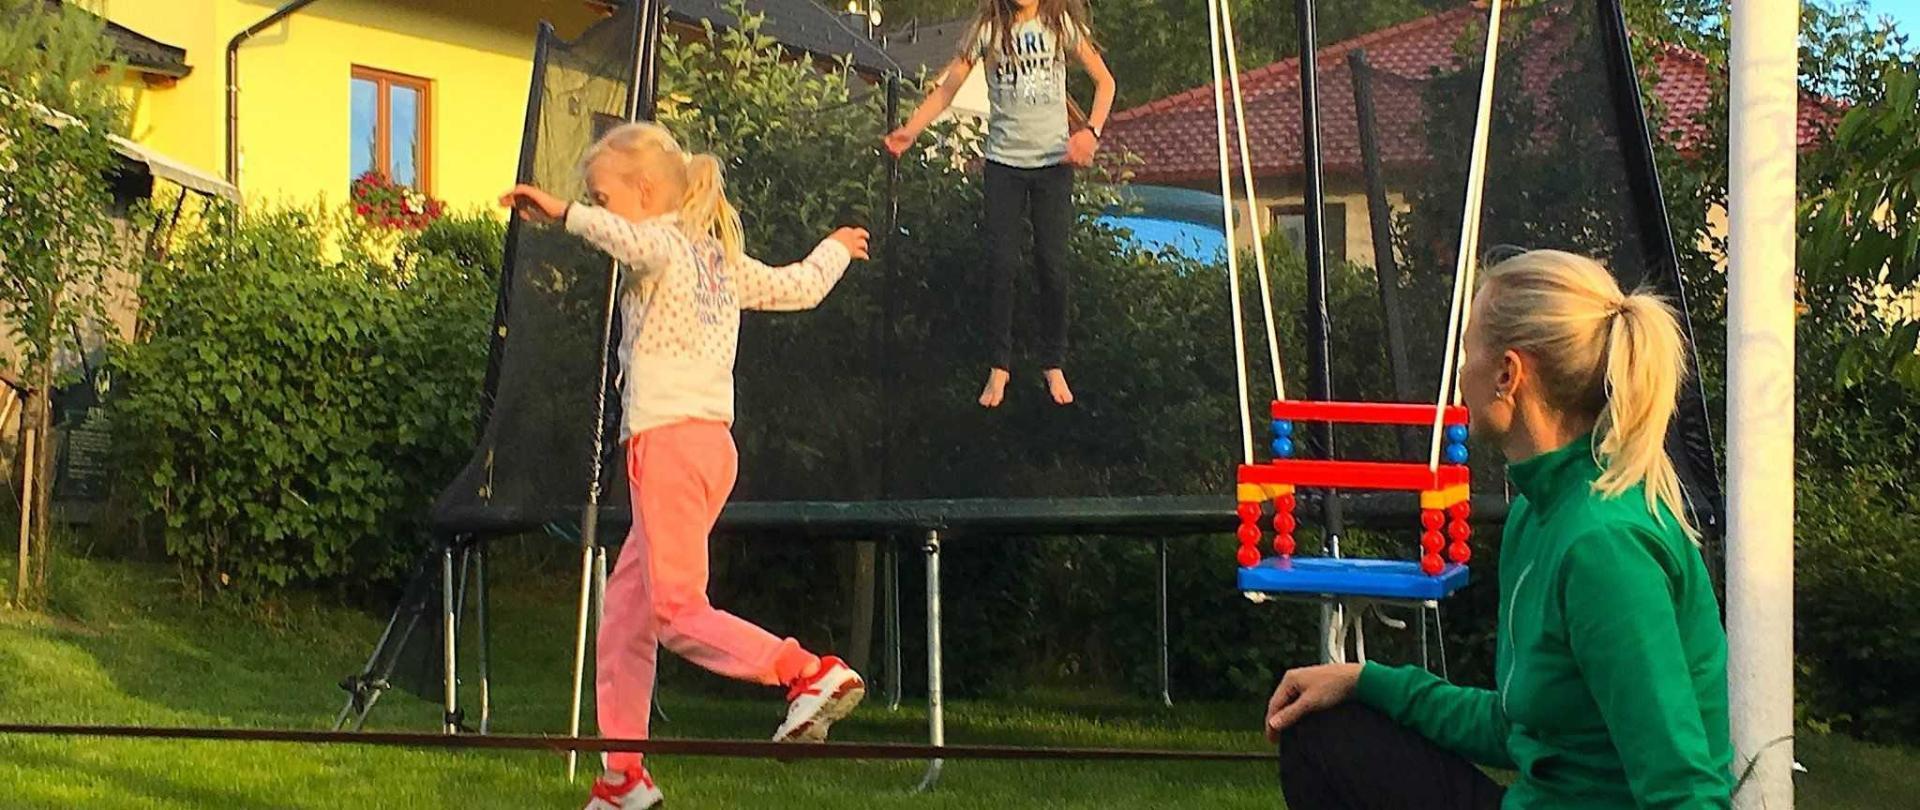 trampoline02-1.JPG